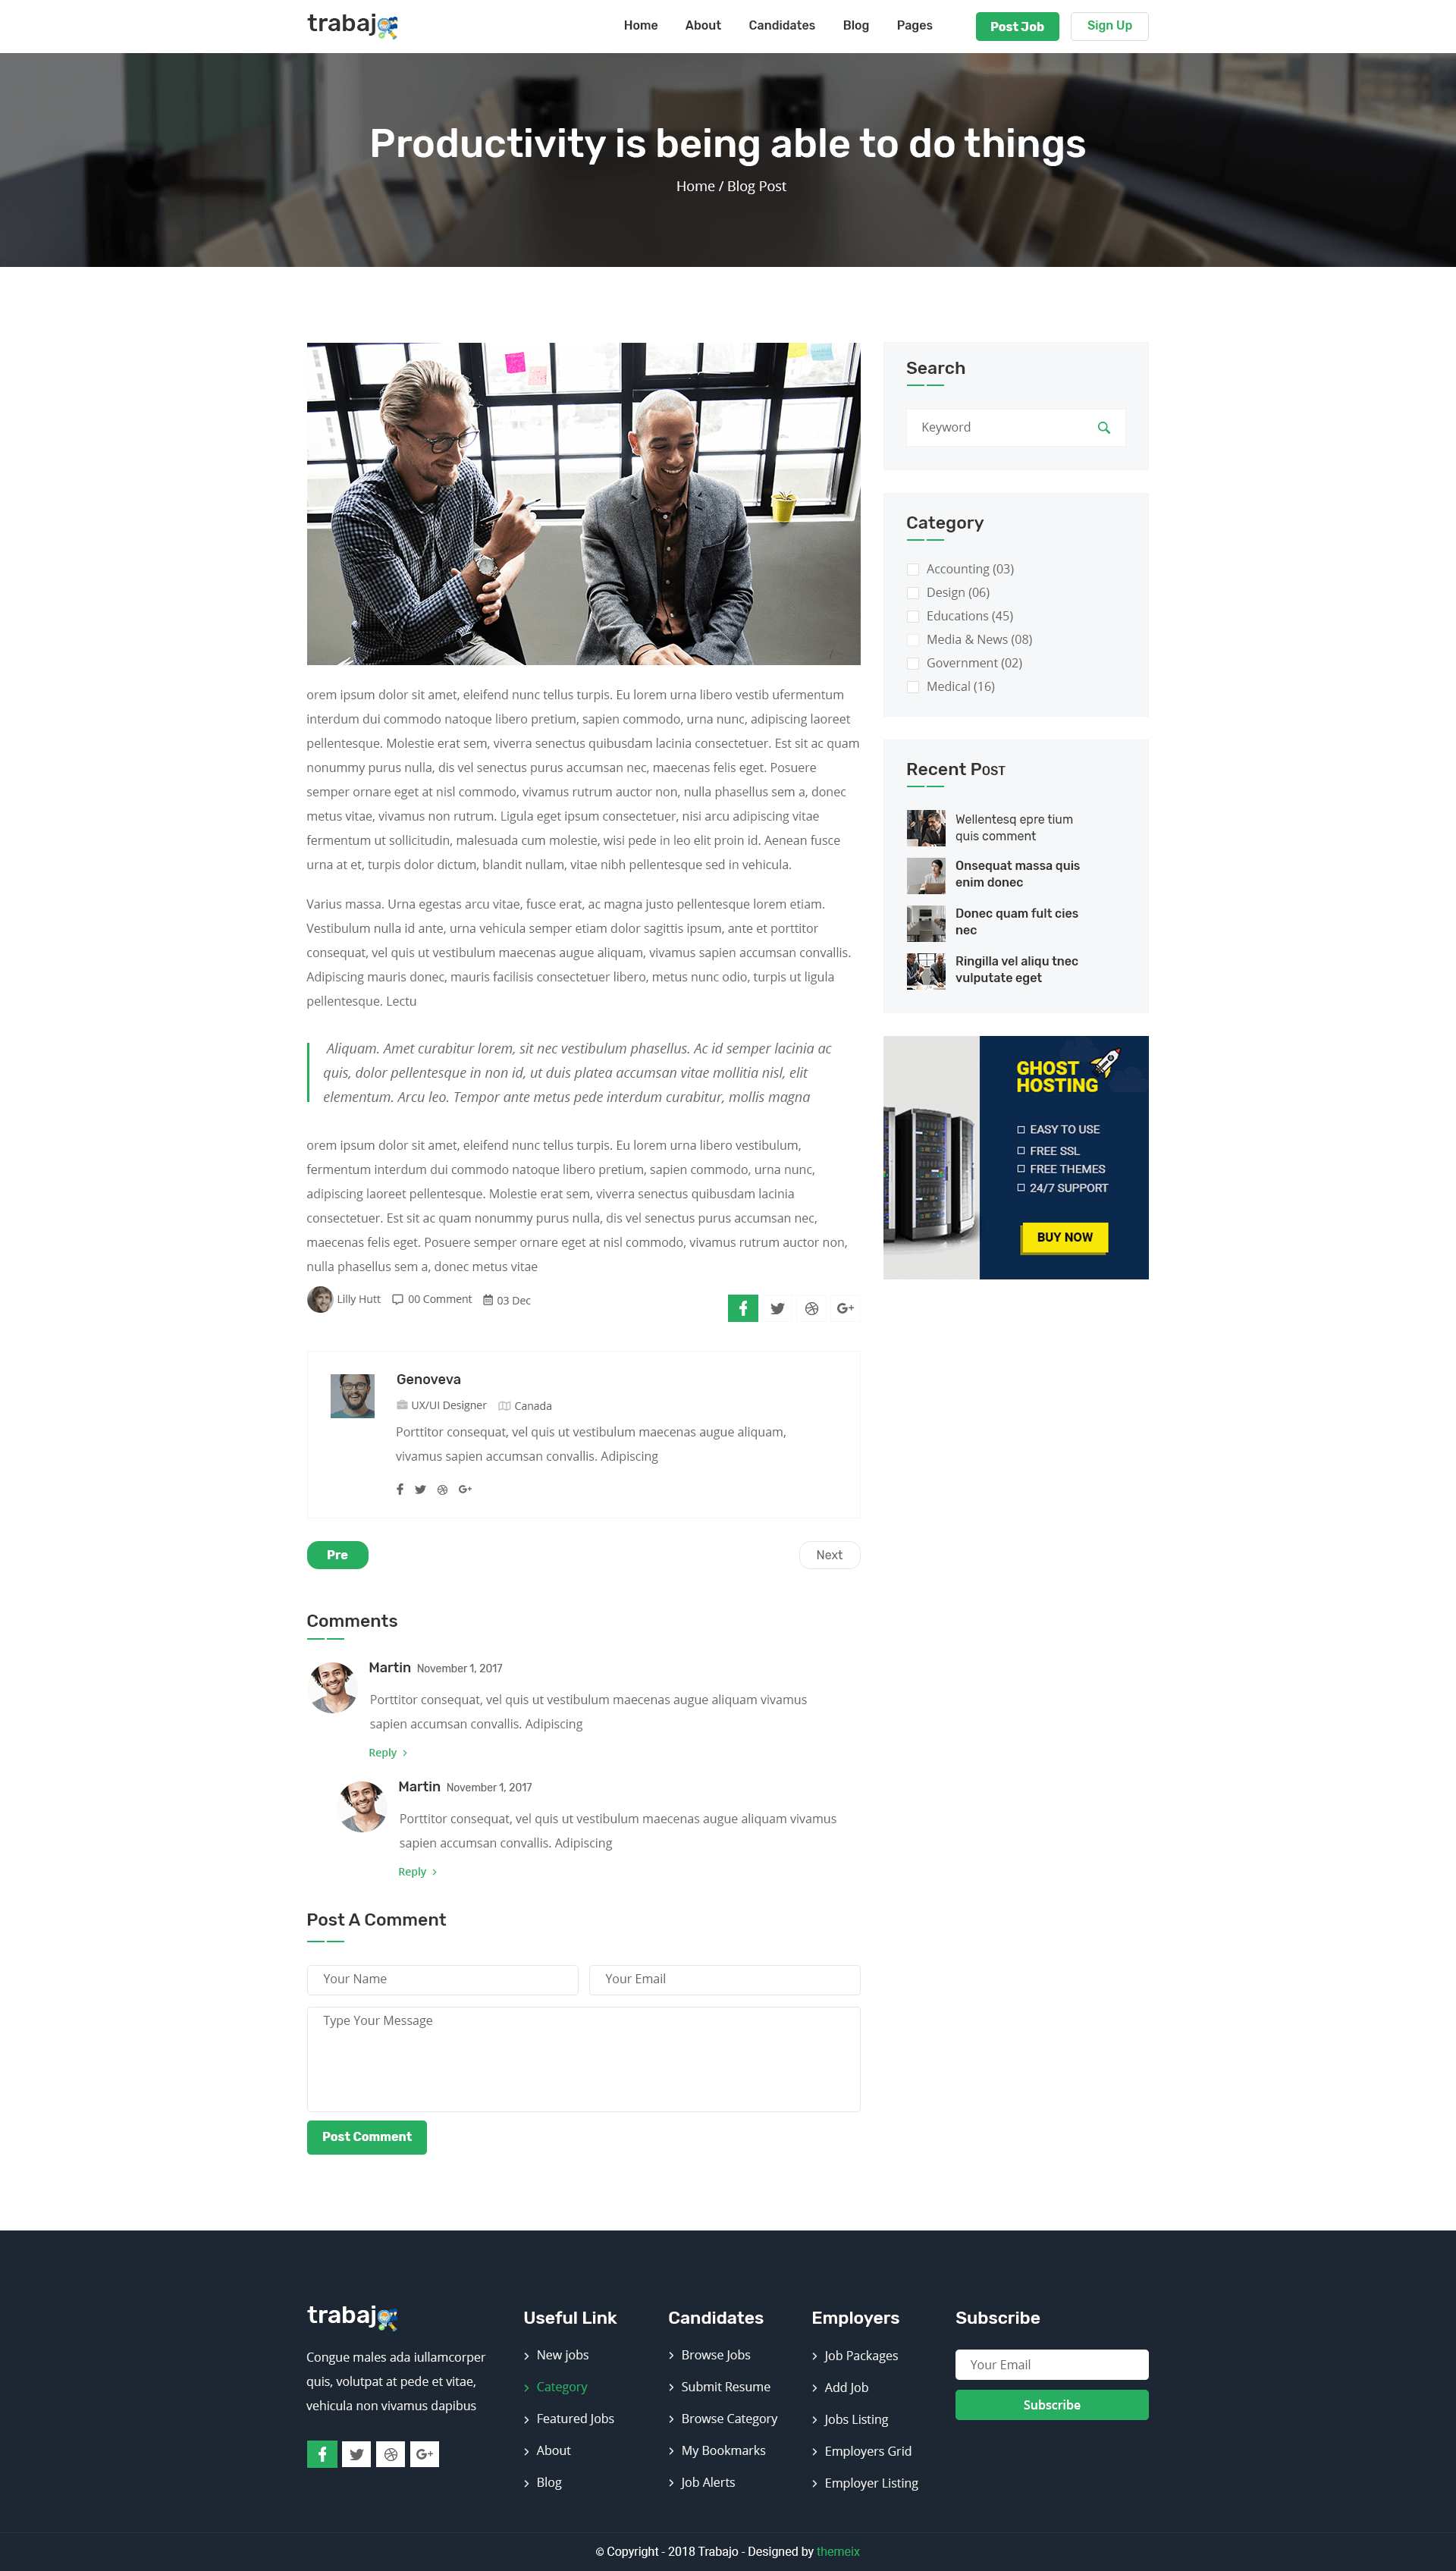 Trabajo - Job Portal Website PSD Template